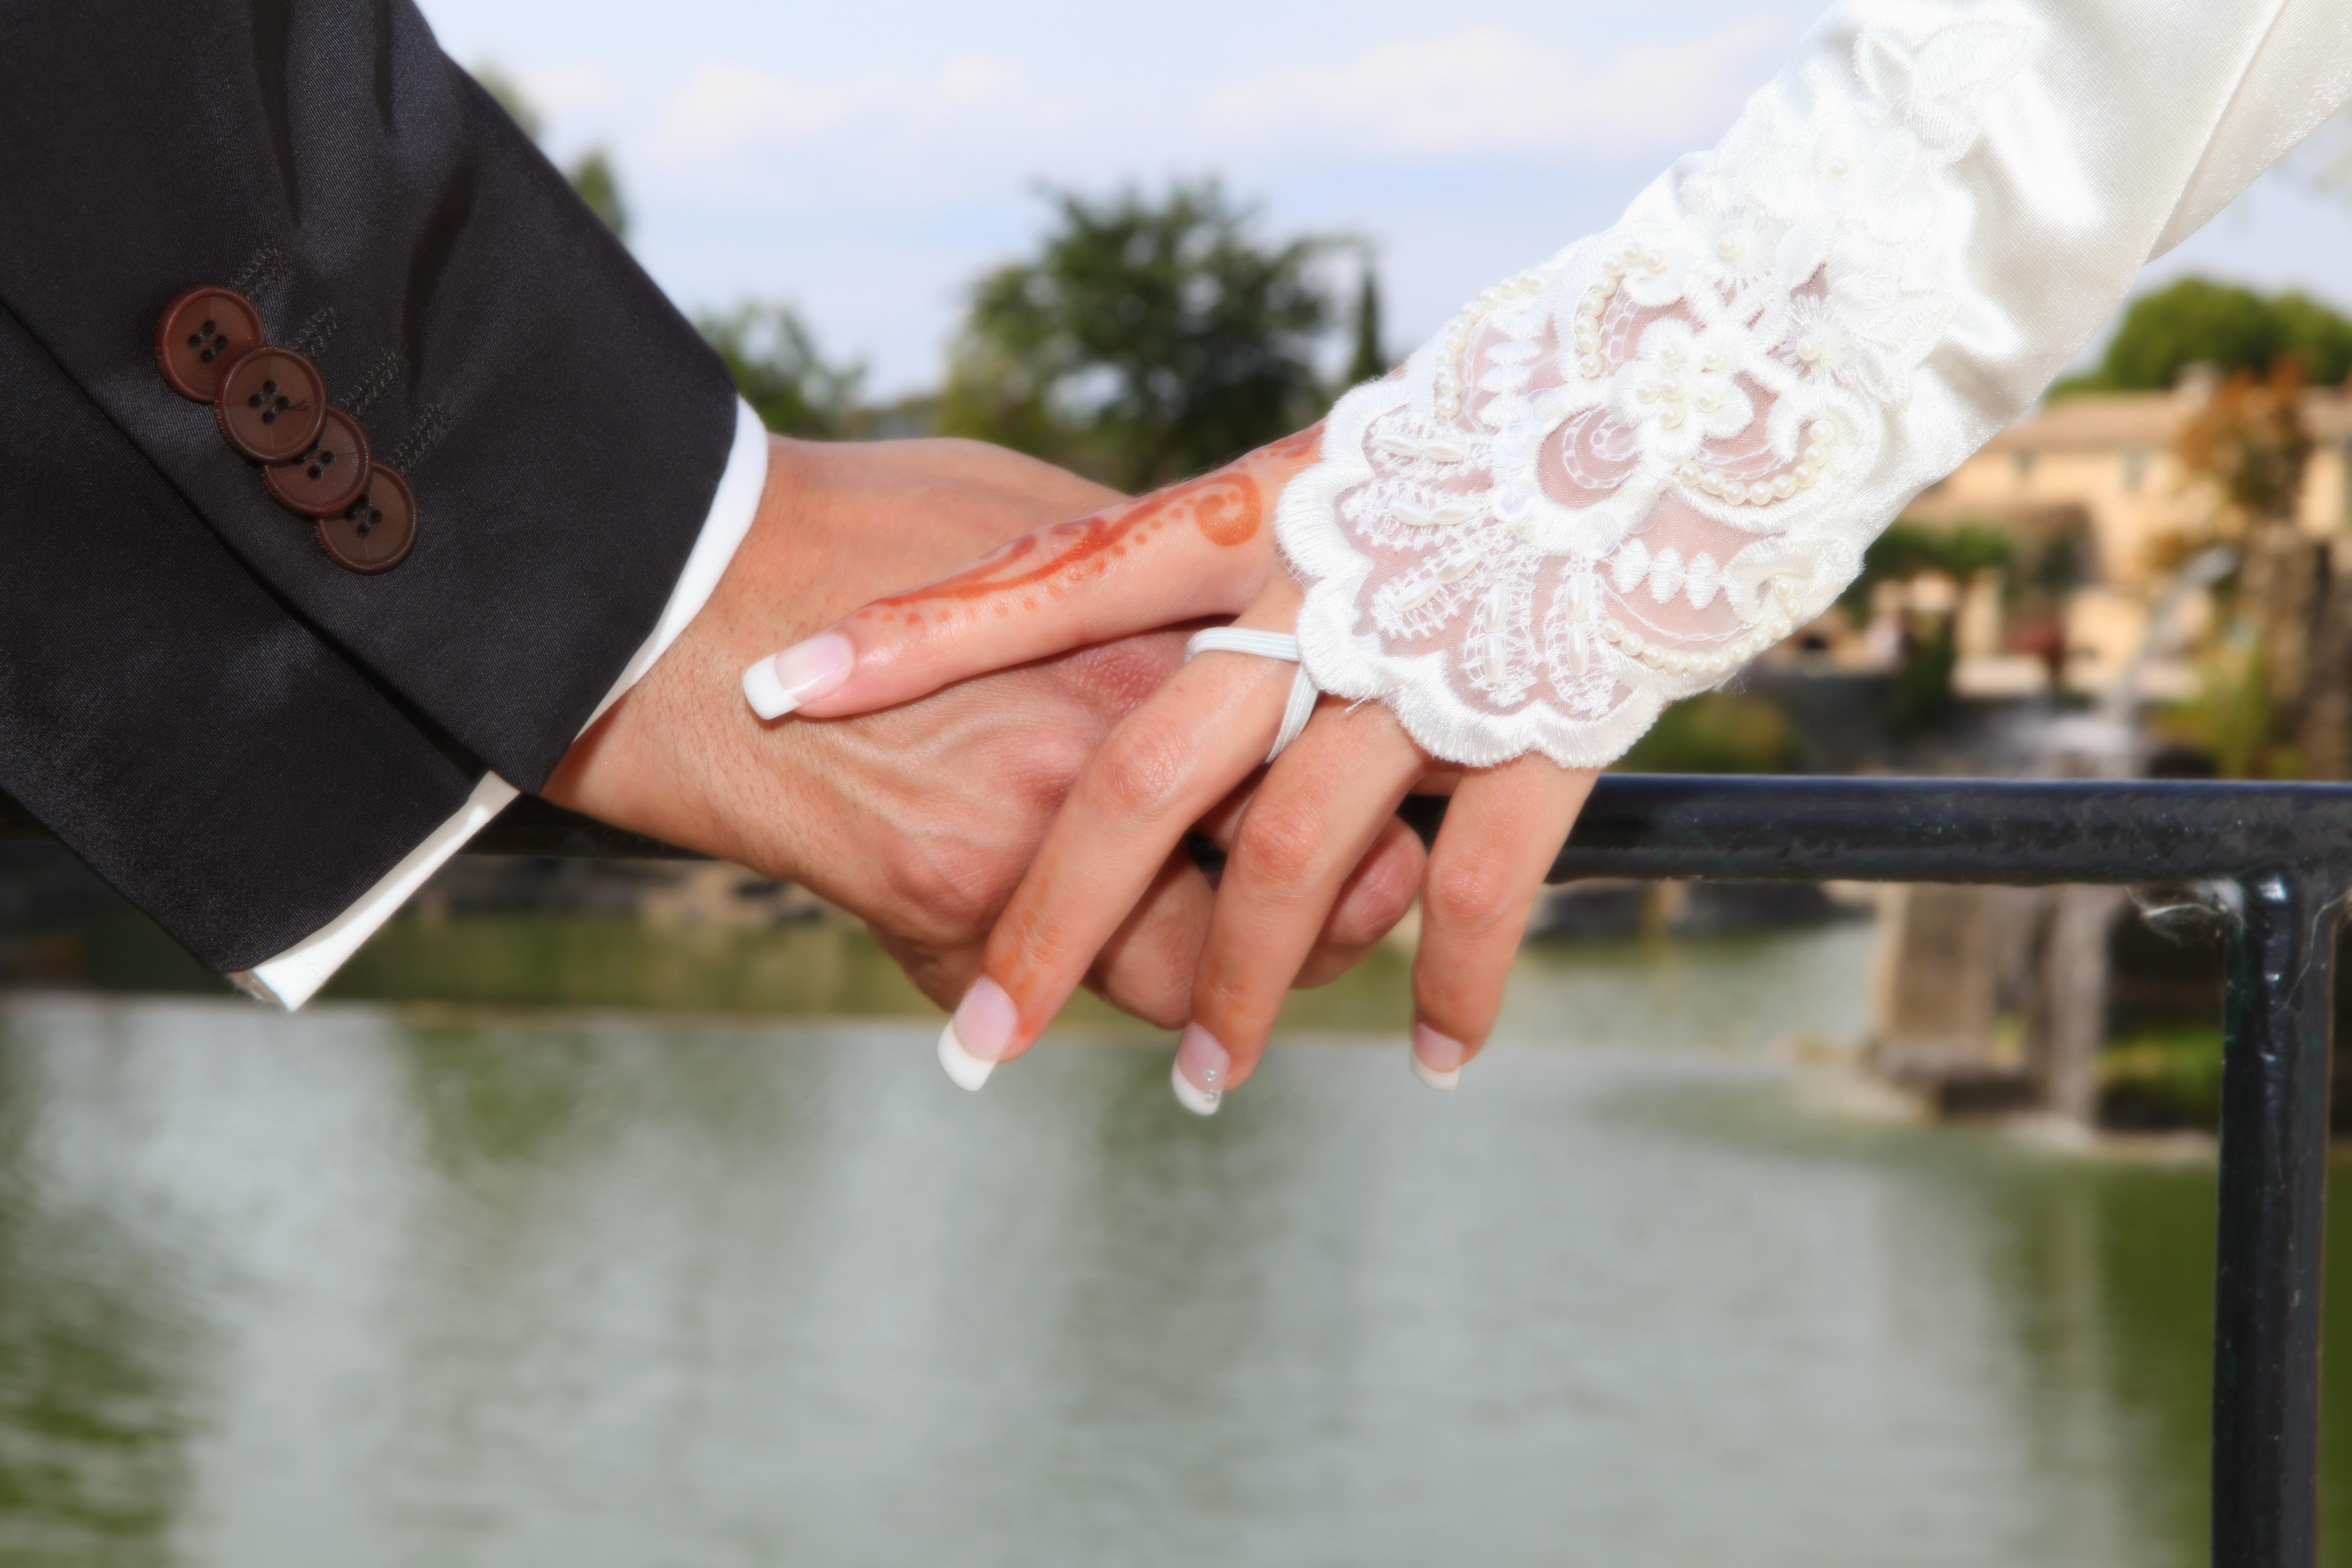 photographe cameraman mariage oriental arabe musulman ste - Photographe Cameraman Mariage Oriental